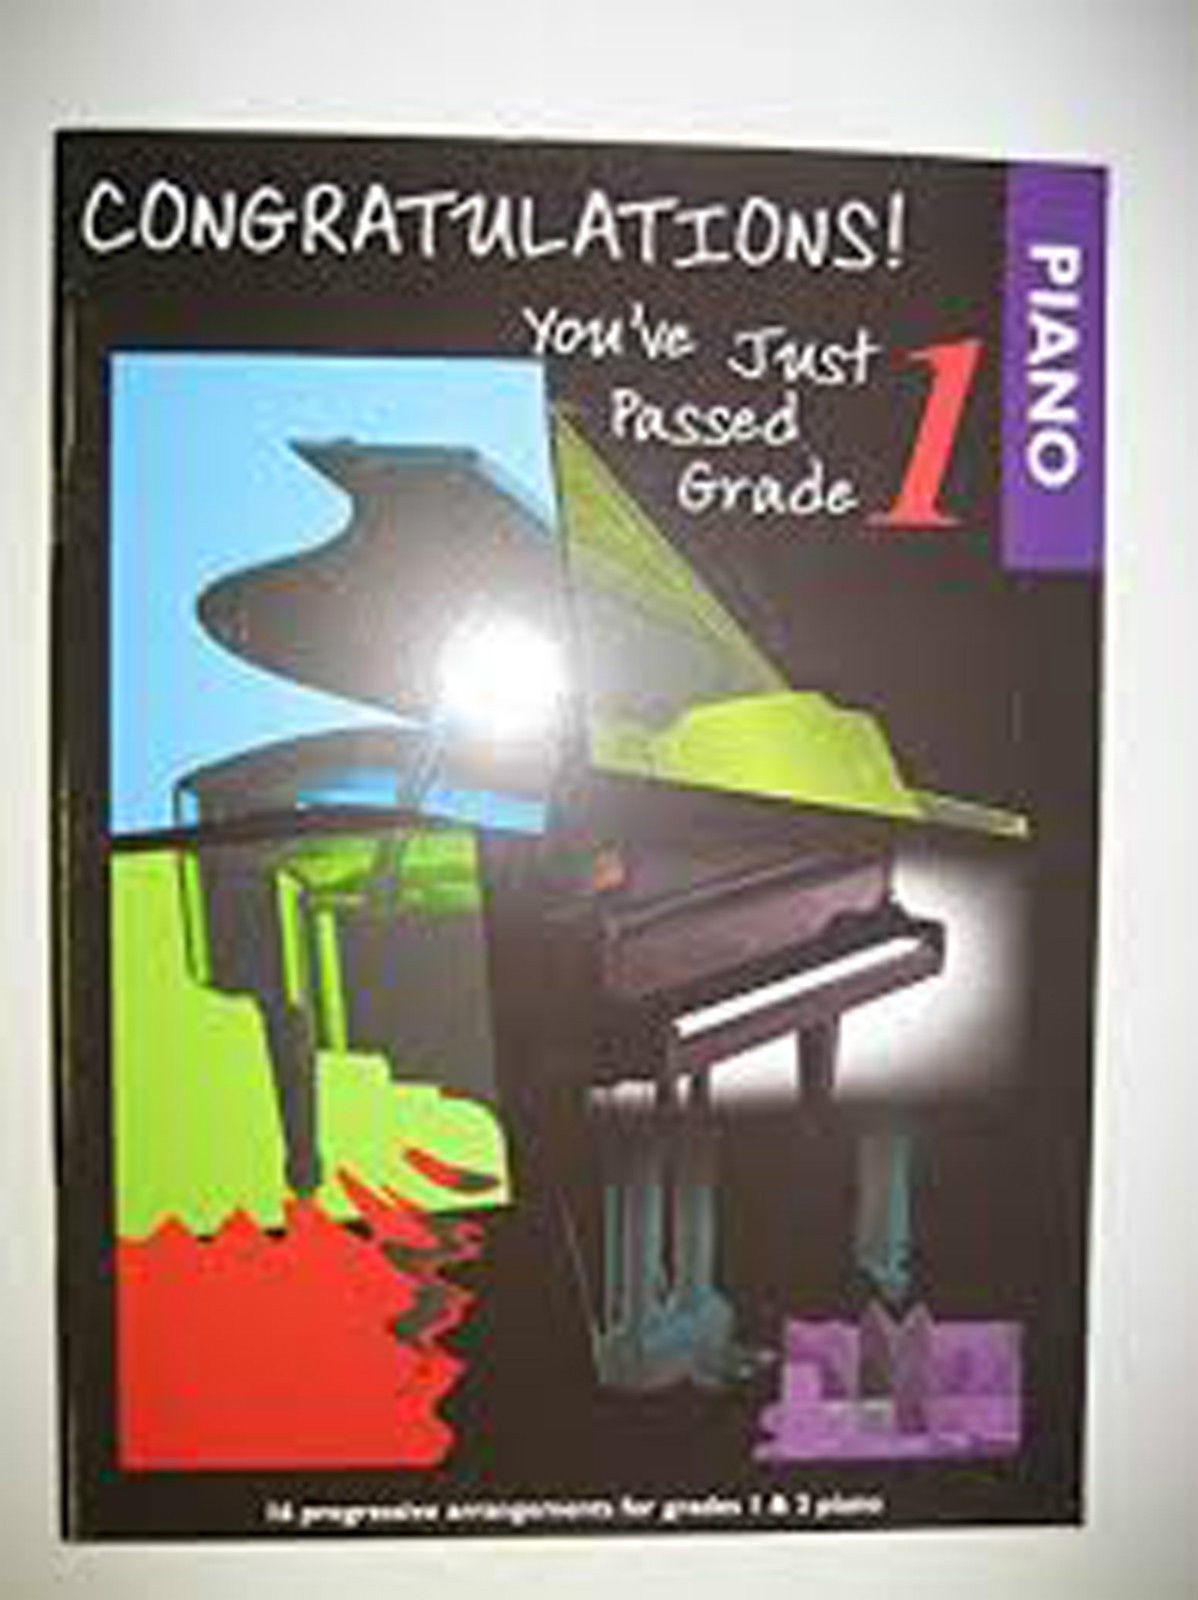 Congratulations You've Just Passed Grade 1 Piano Pieces Fun Repertoire Music B83